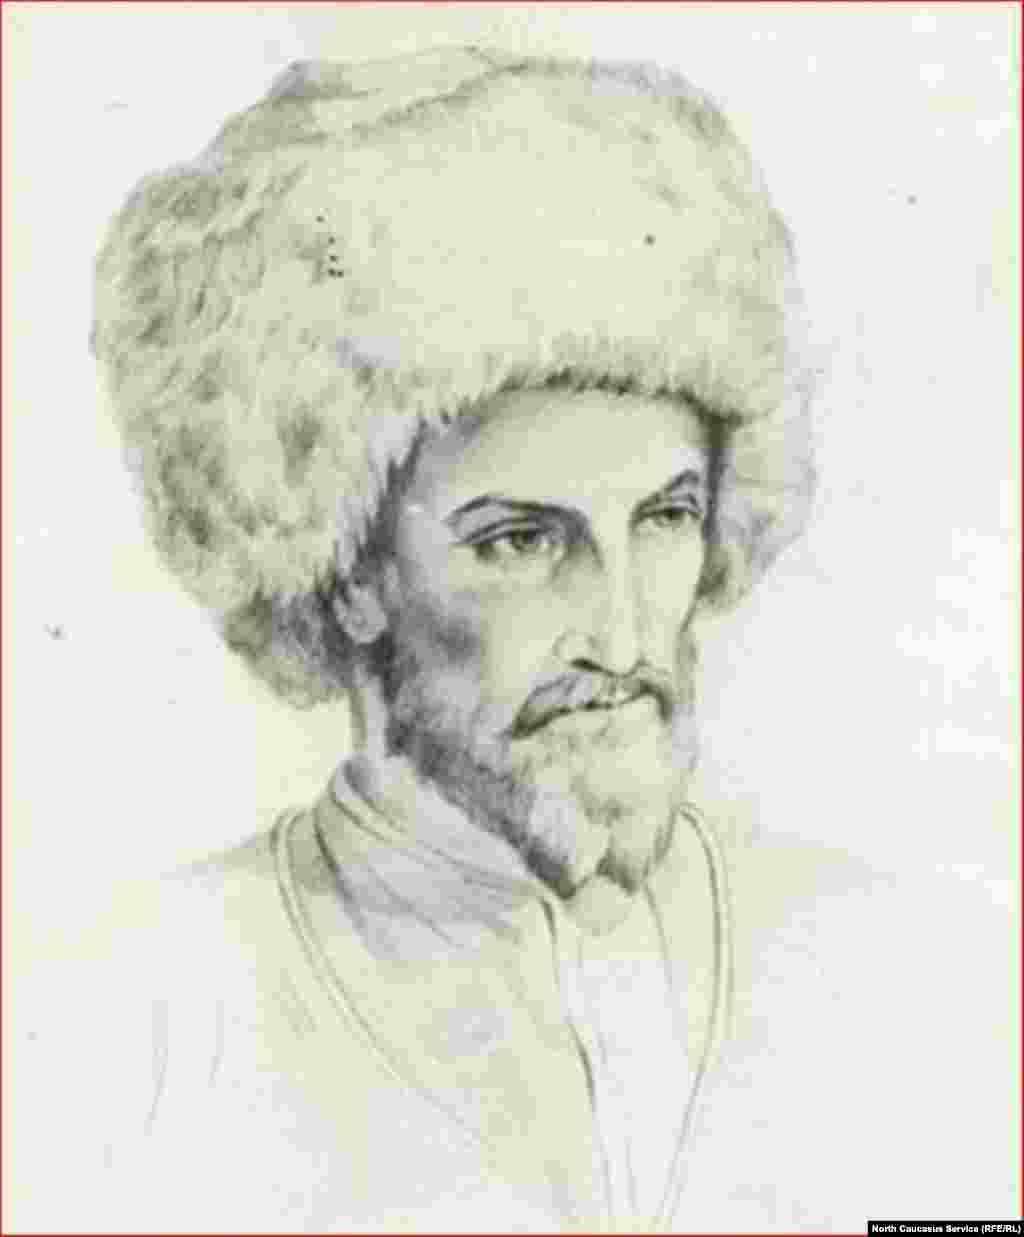 Наиб Мирза Хазьяо - письмоводитель Шамиля. Богатырев И.С., кон.1920-х - нач.1930-х гг.